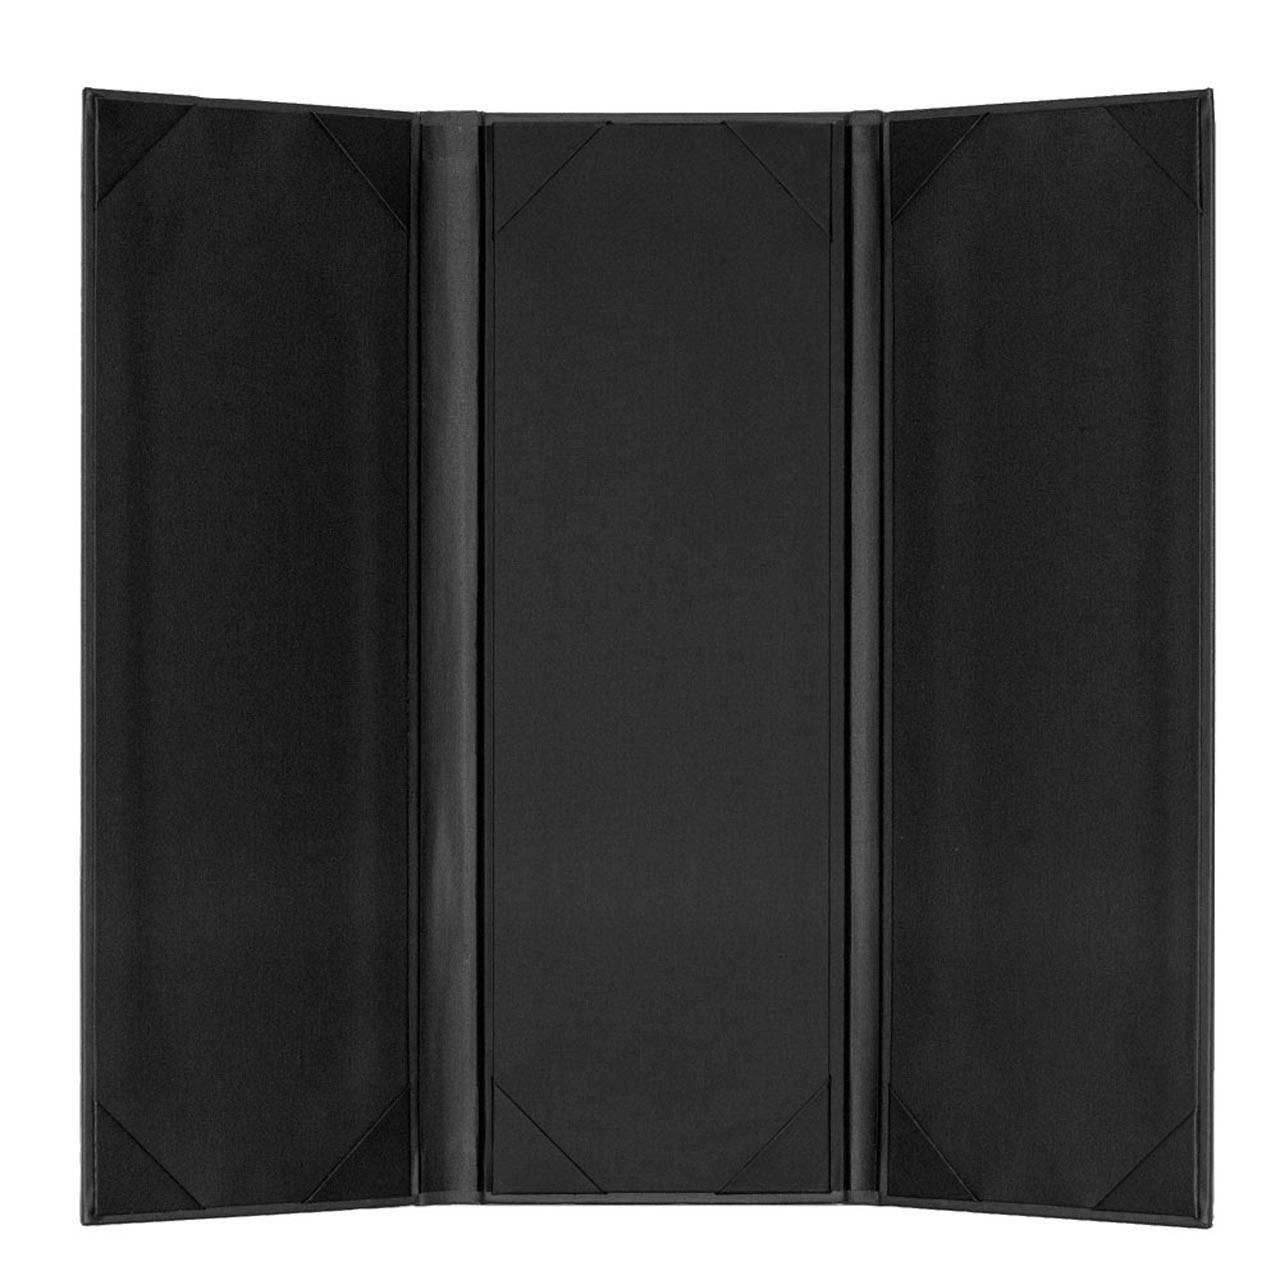 3 panel, trifold (inside)